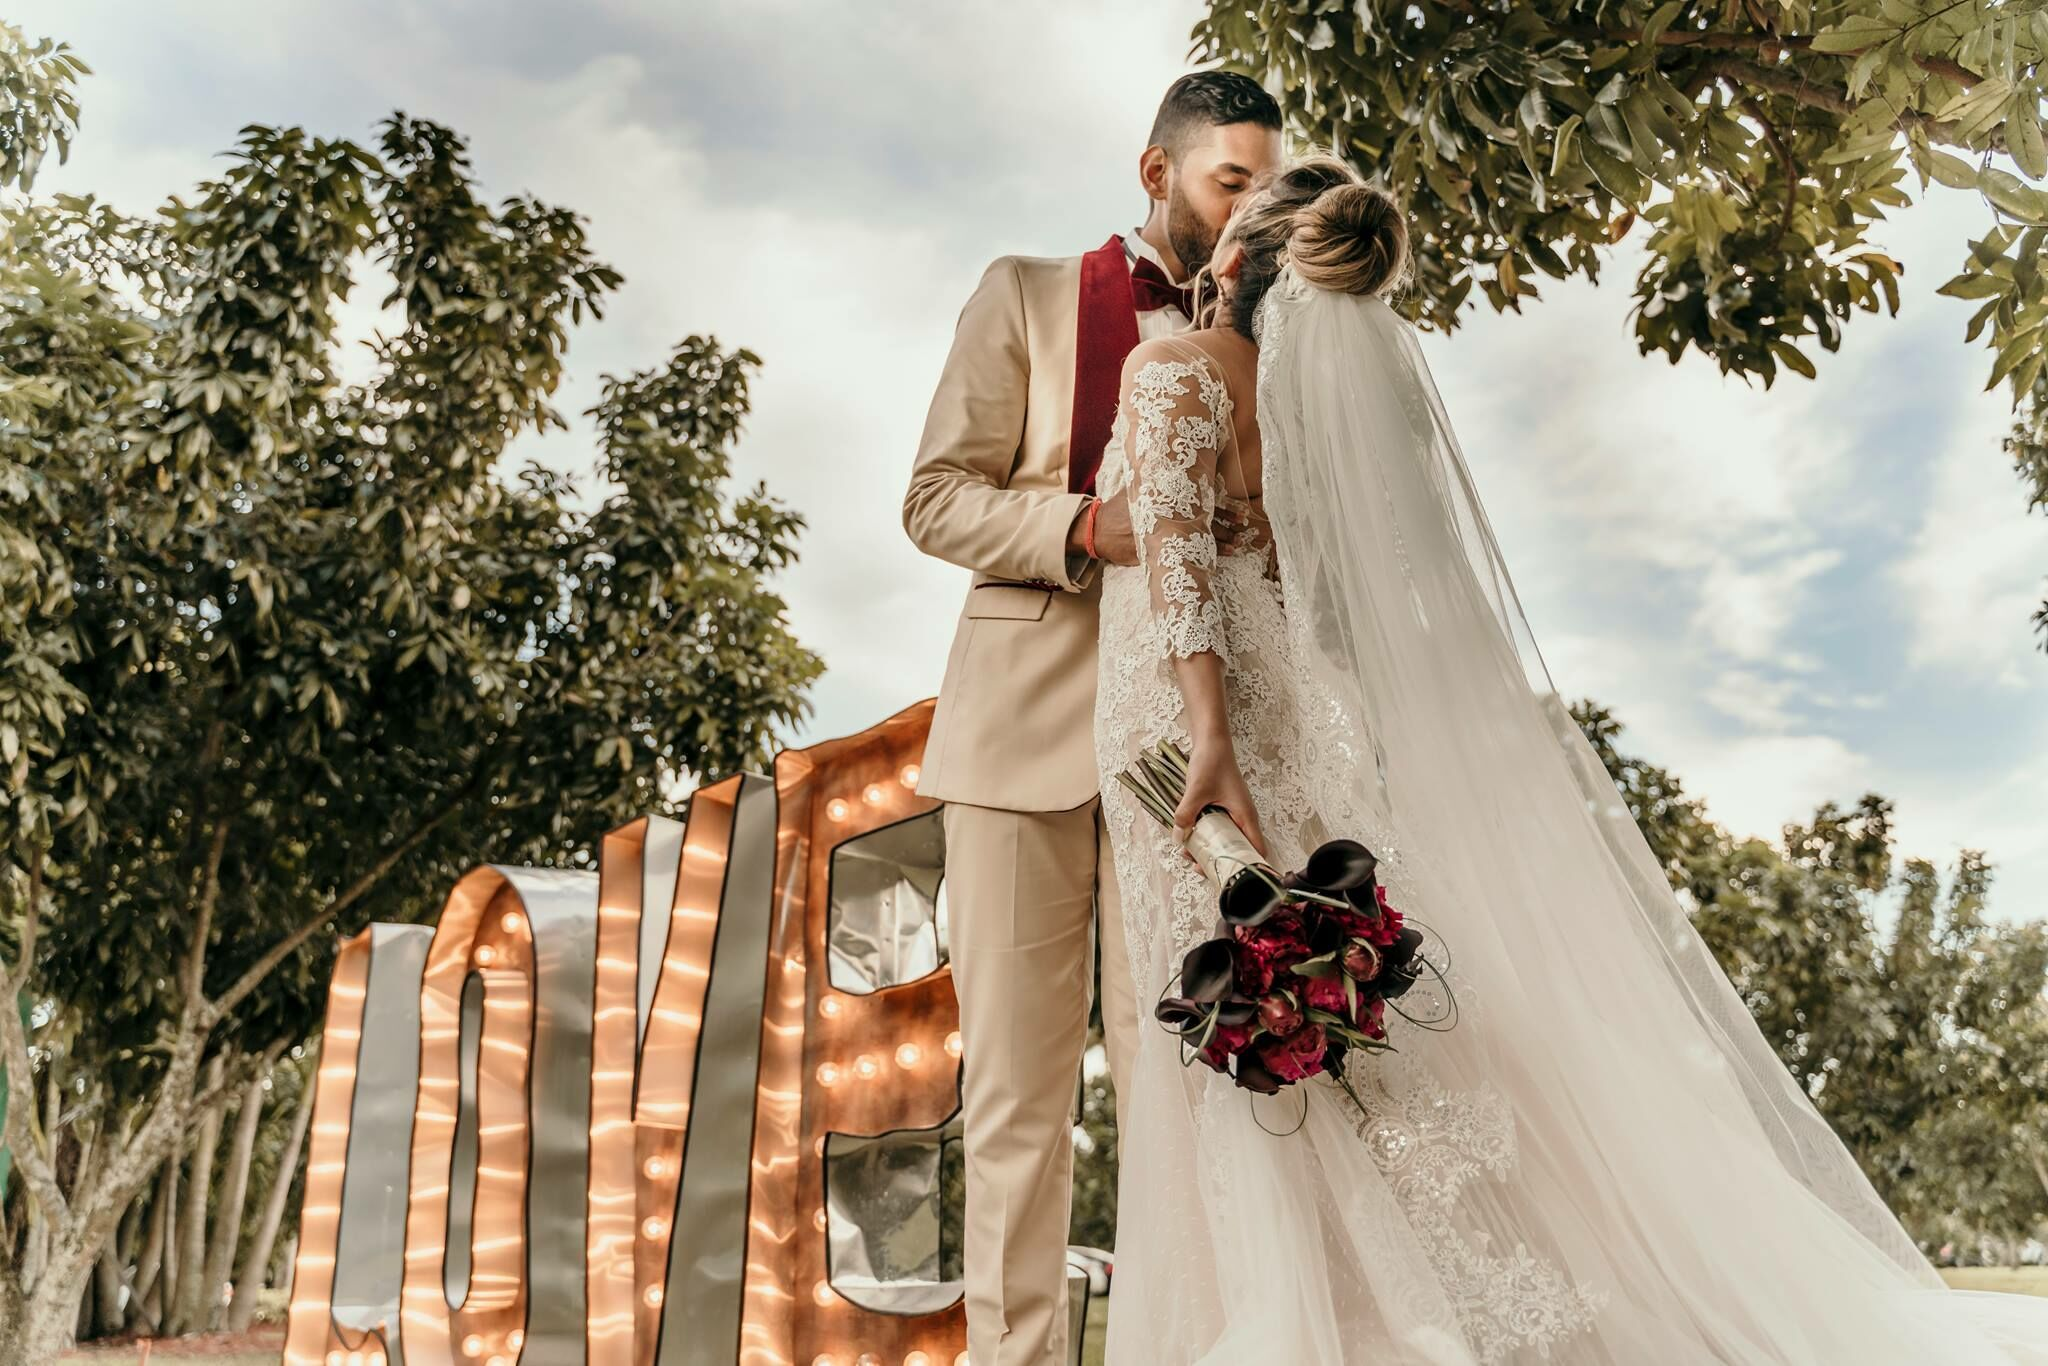 Pin on Wedding Venues